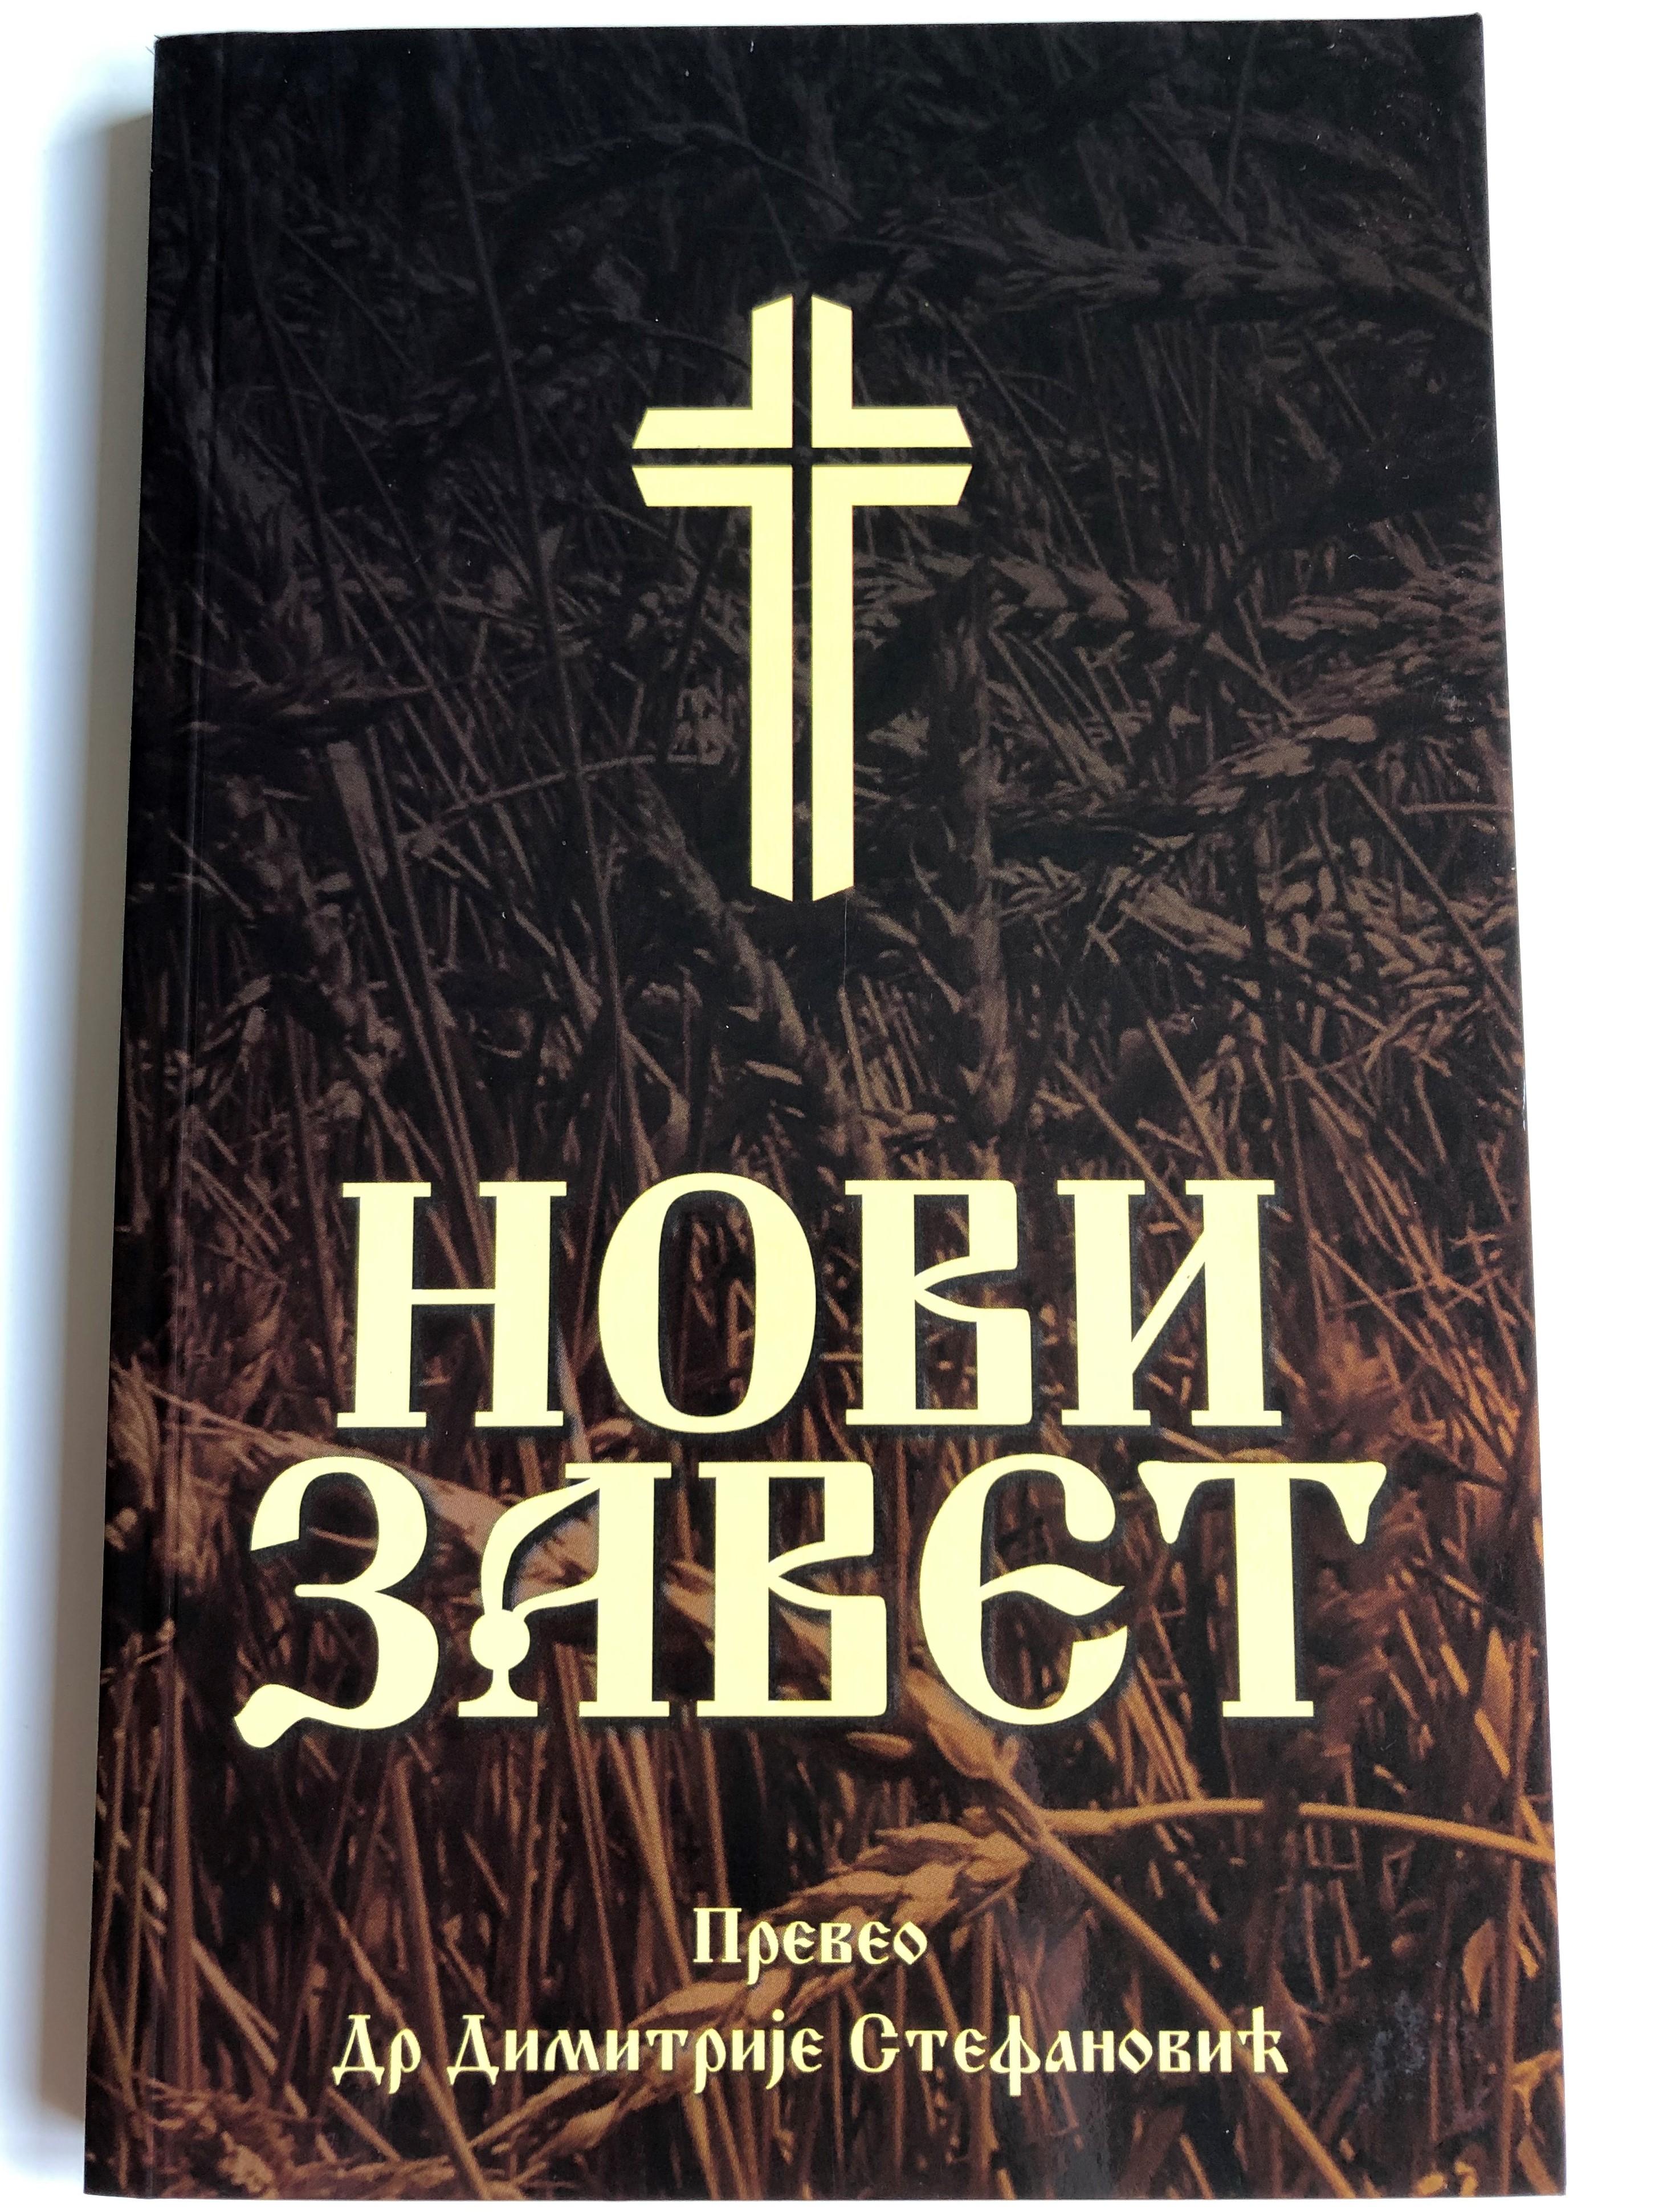 -serbian-new-testament-dr.-dimitrije-stefanovi-translation-paperback-biblijska-liga-2004-novi-zavet-1.jpg